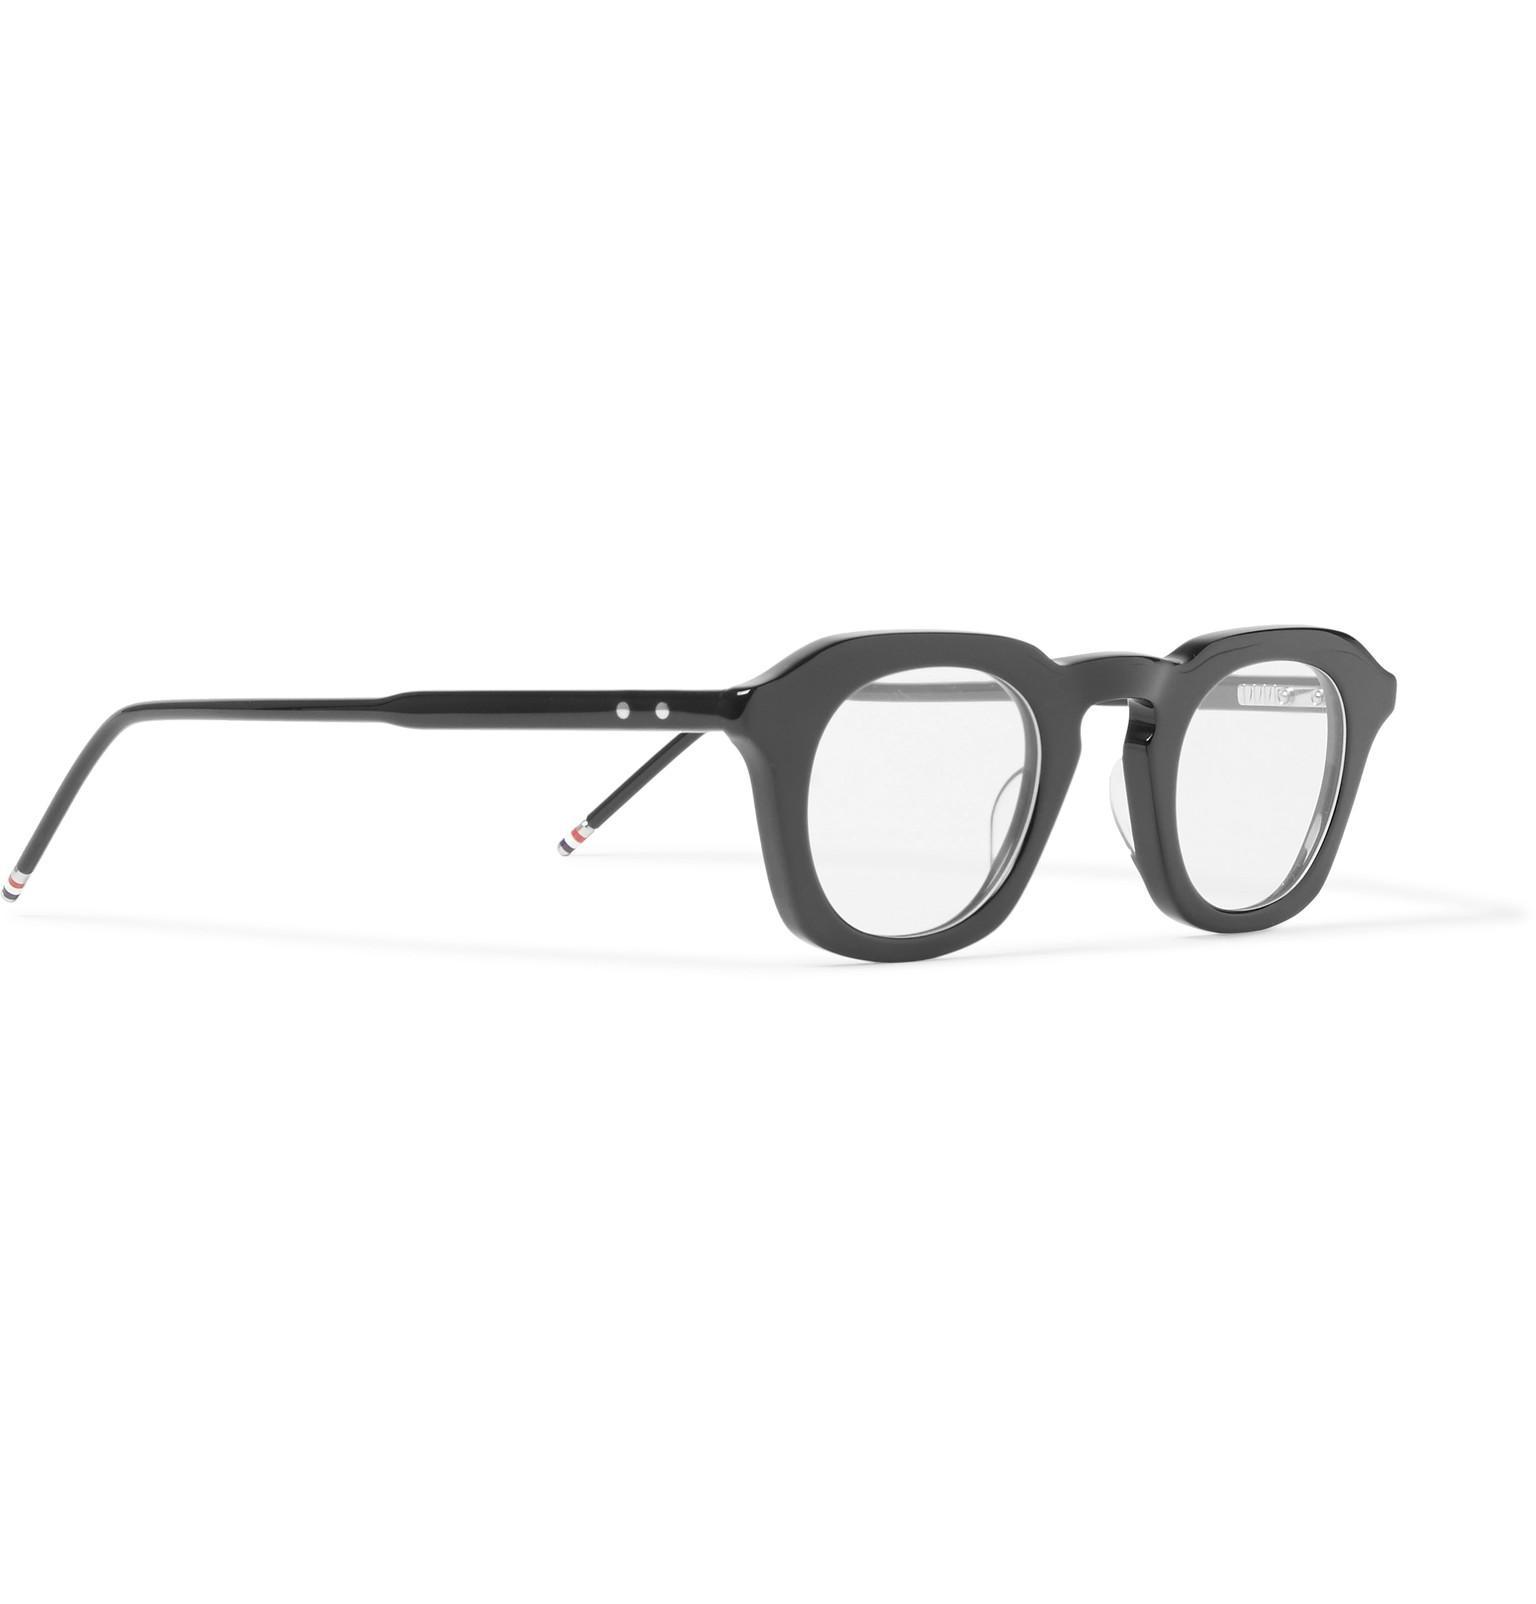 6bdcc2d9cb282 Thom Browne 414 D-frame Acetate Optical Glasses in Black for Men - Lyst